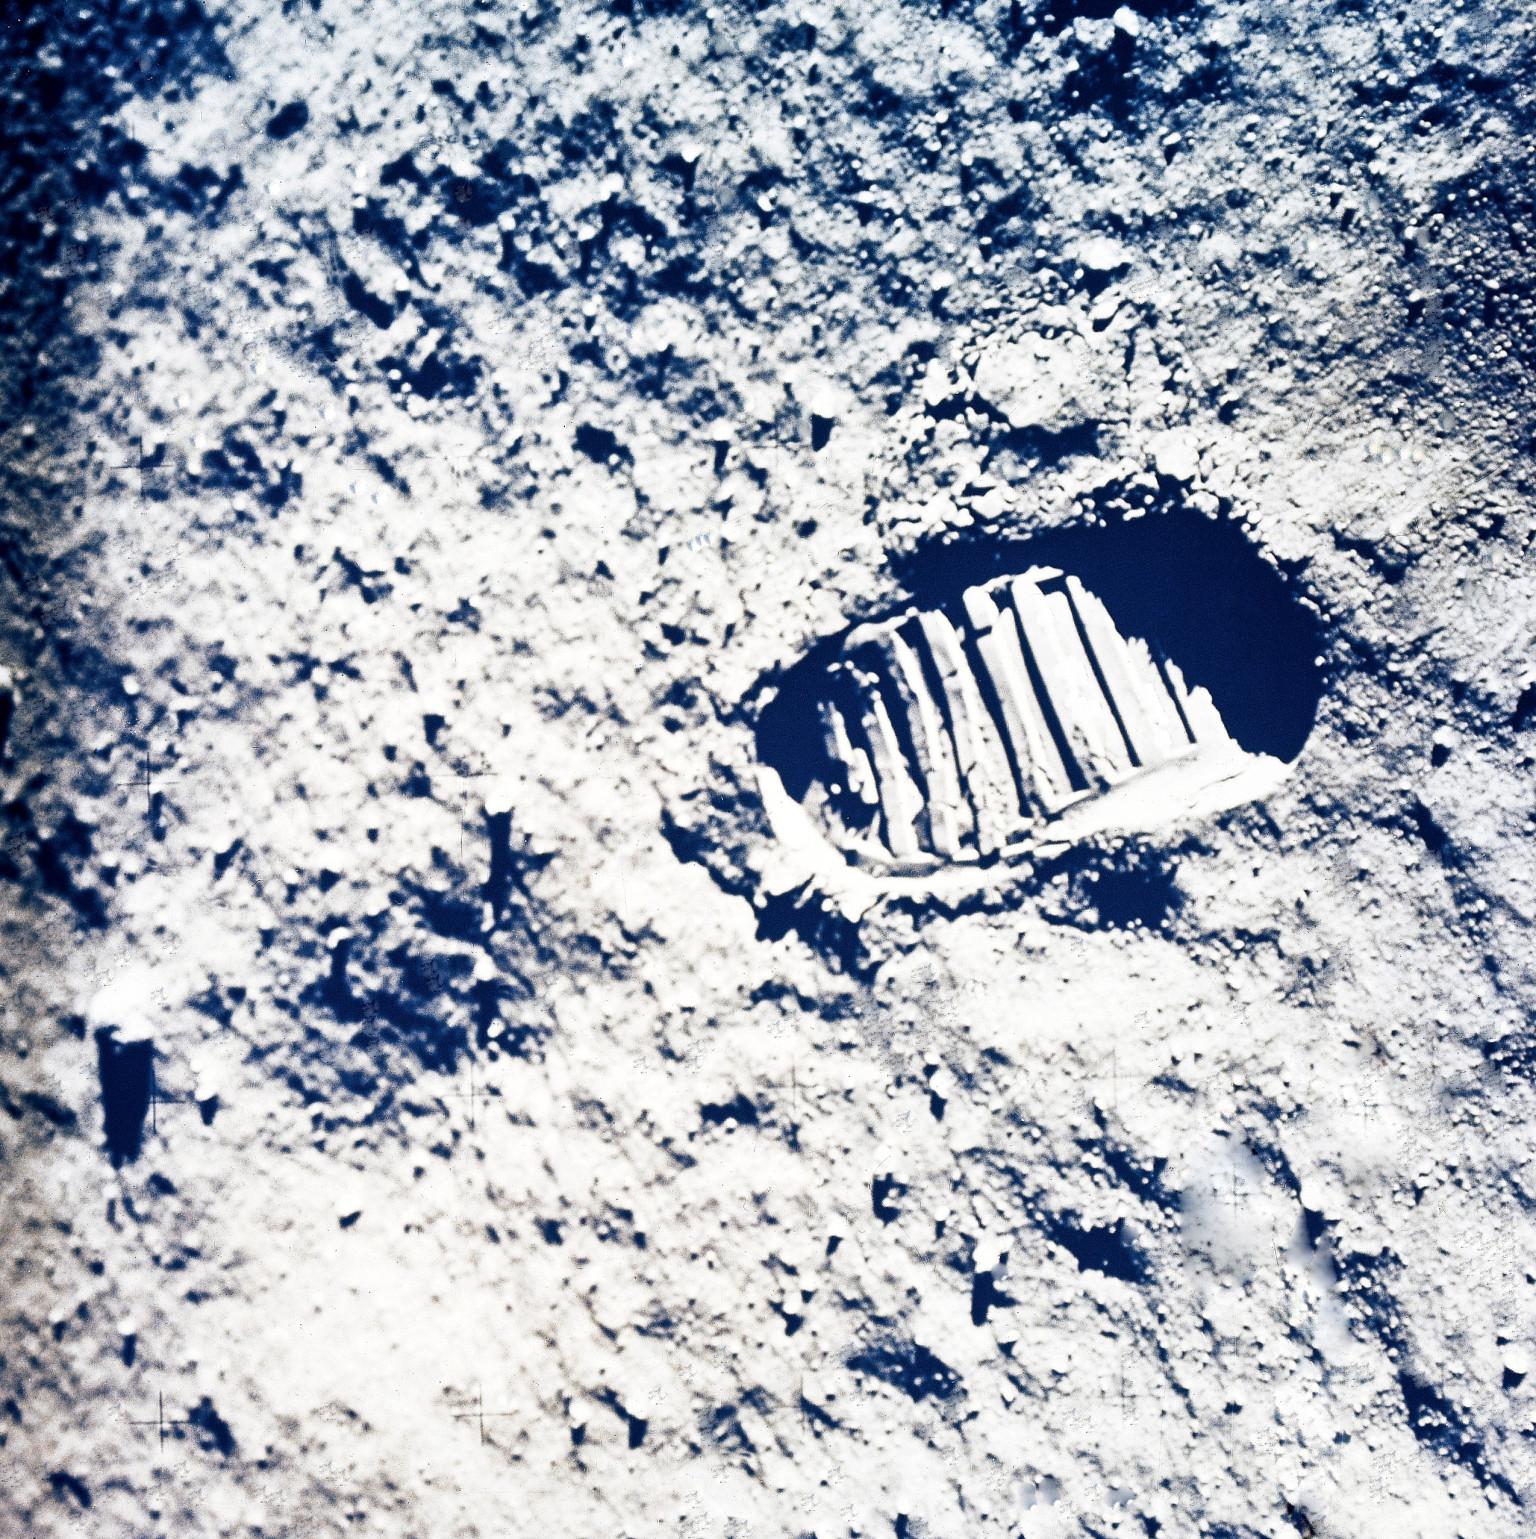 hoax moon landing footprint - photo #12